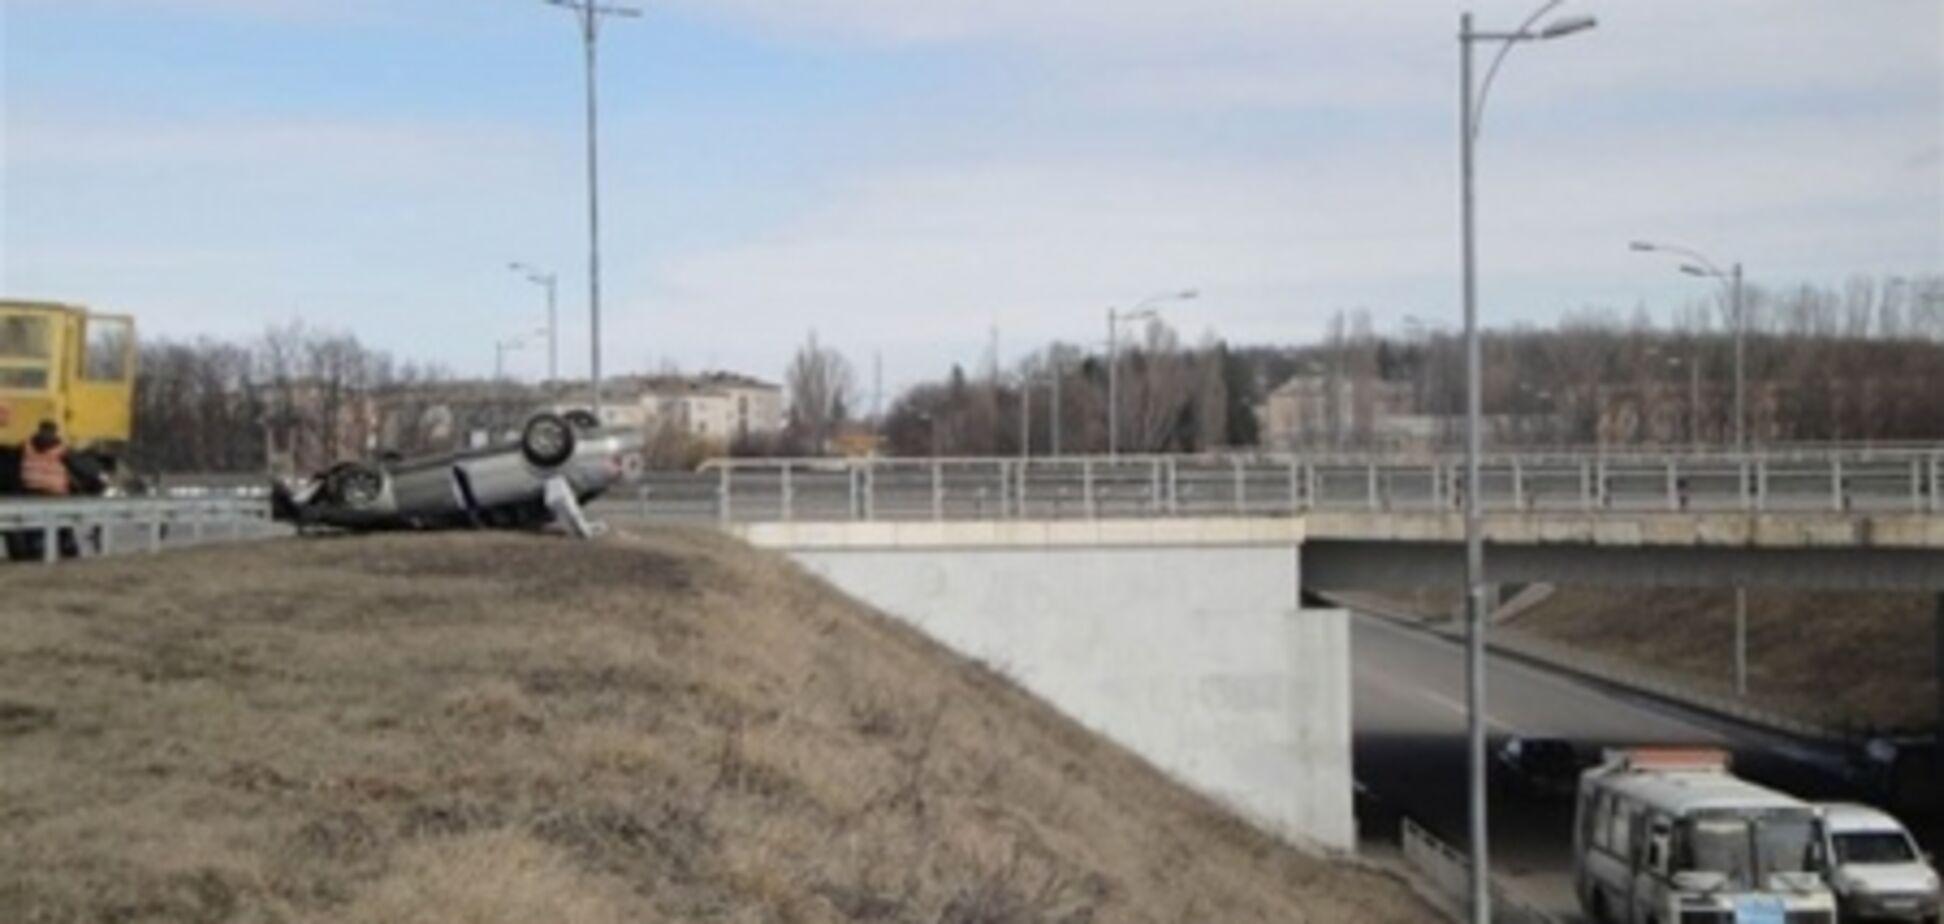 Ситуация на дорогах за 16 марта: 57 ДТП, 6 погибших